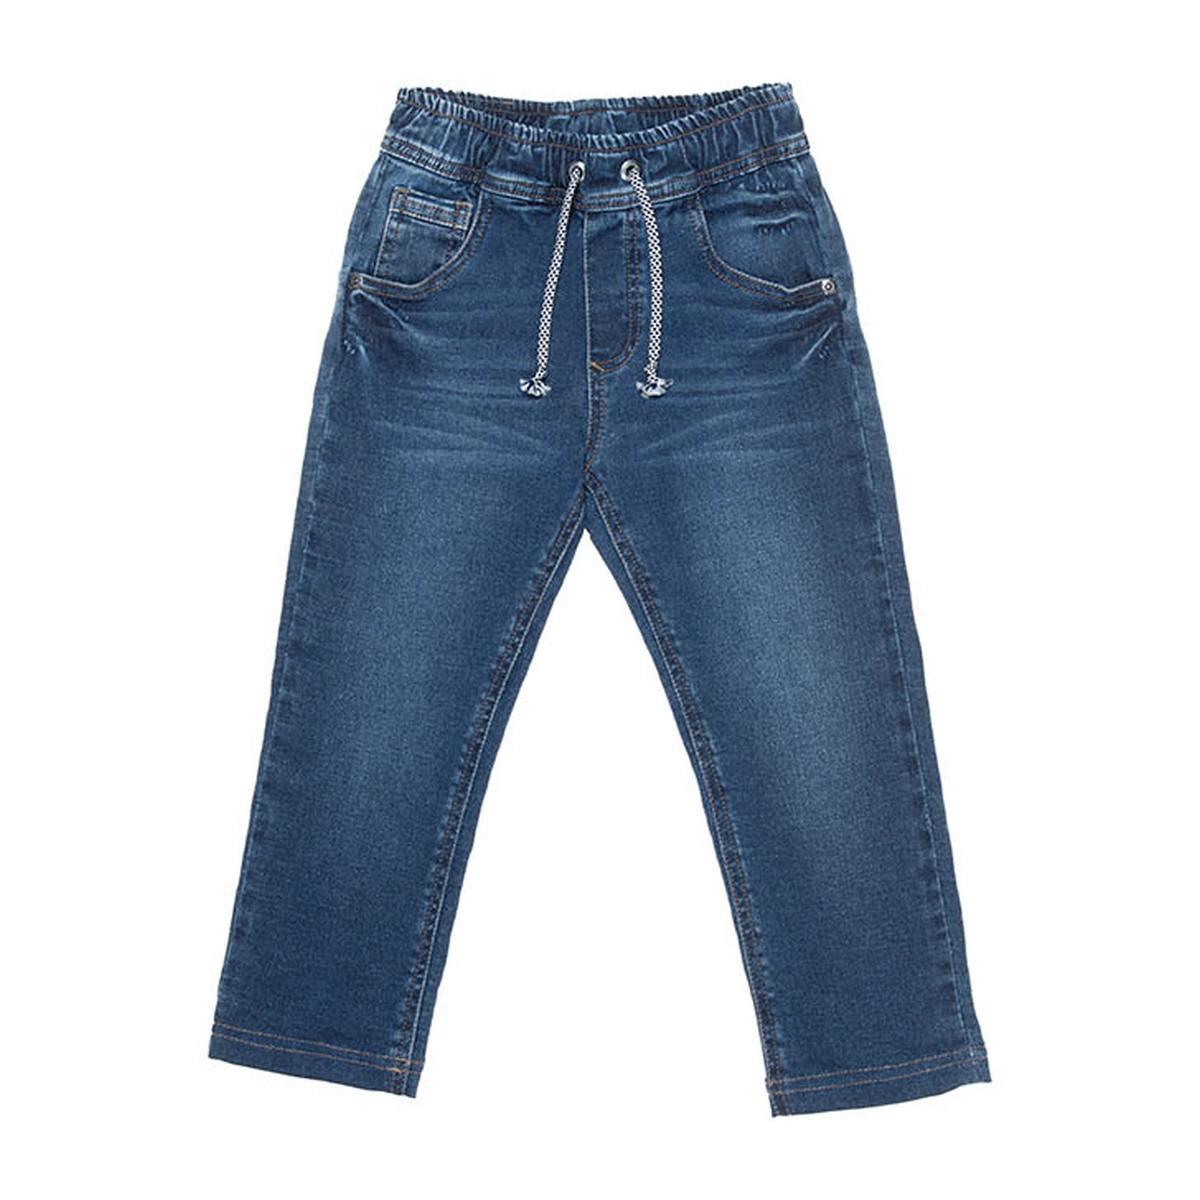 Calça Jeans Menino Jogger  -  Mania Kids